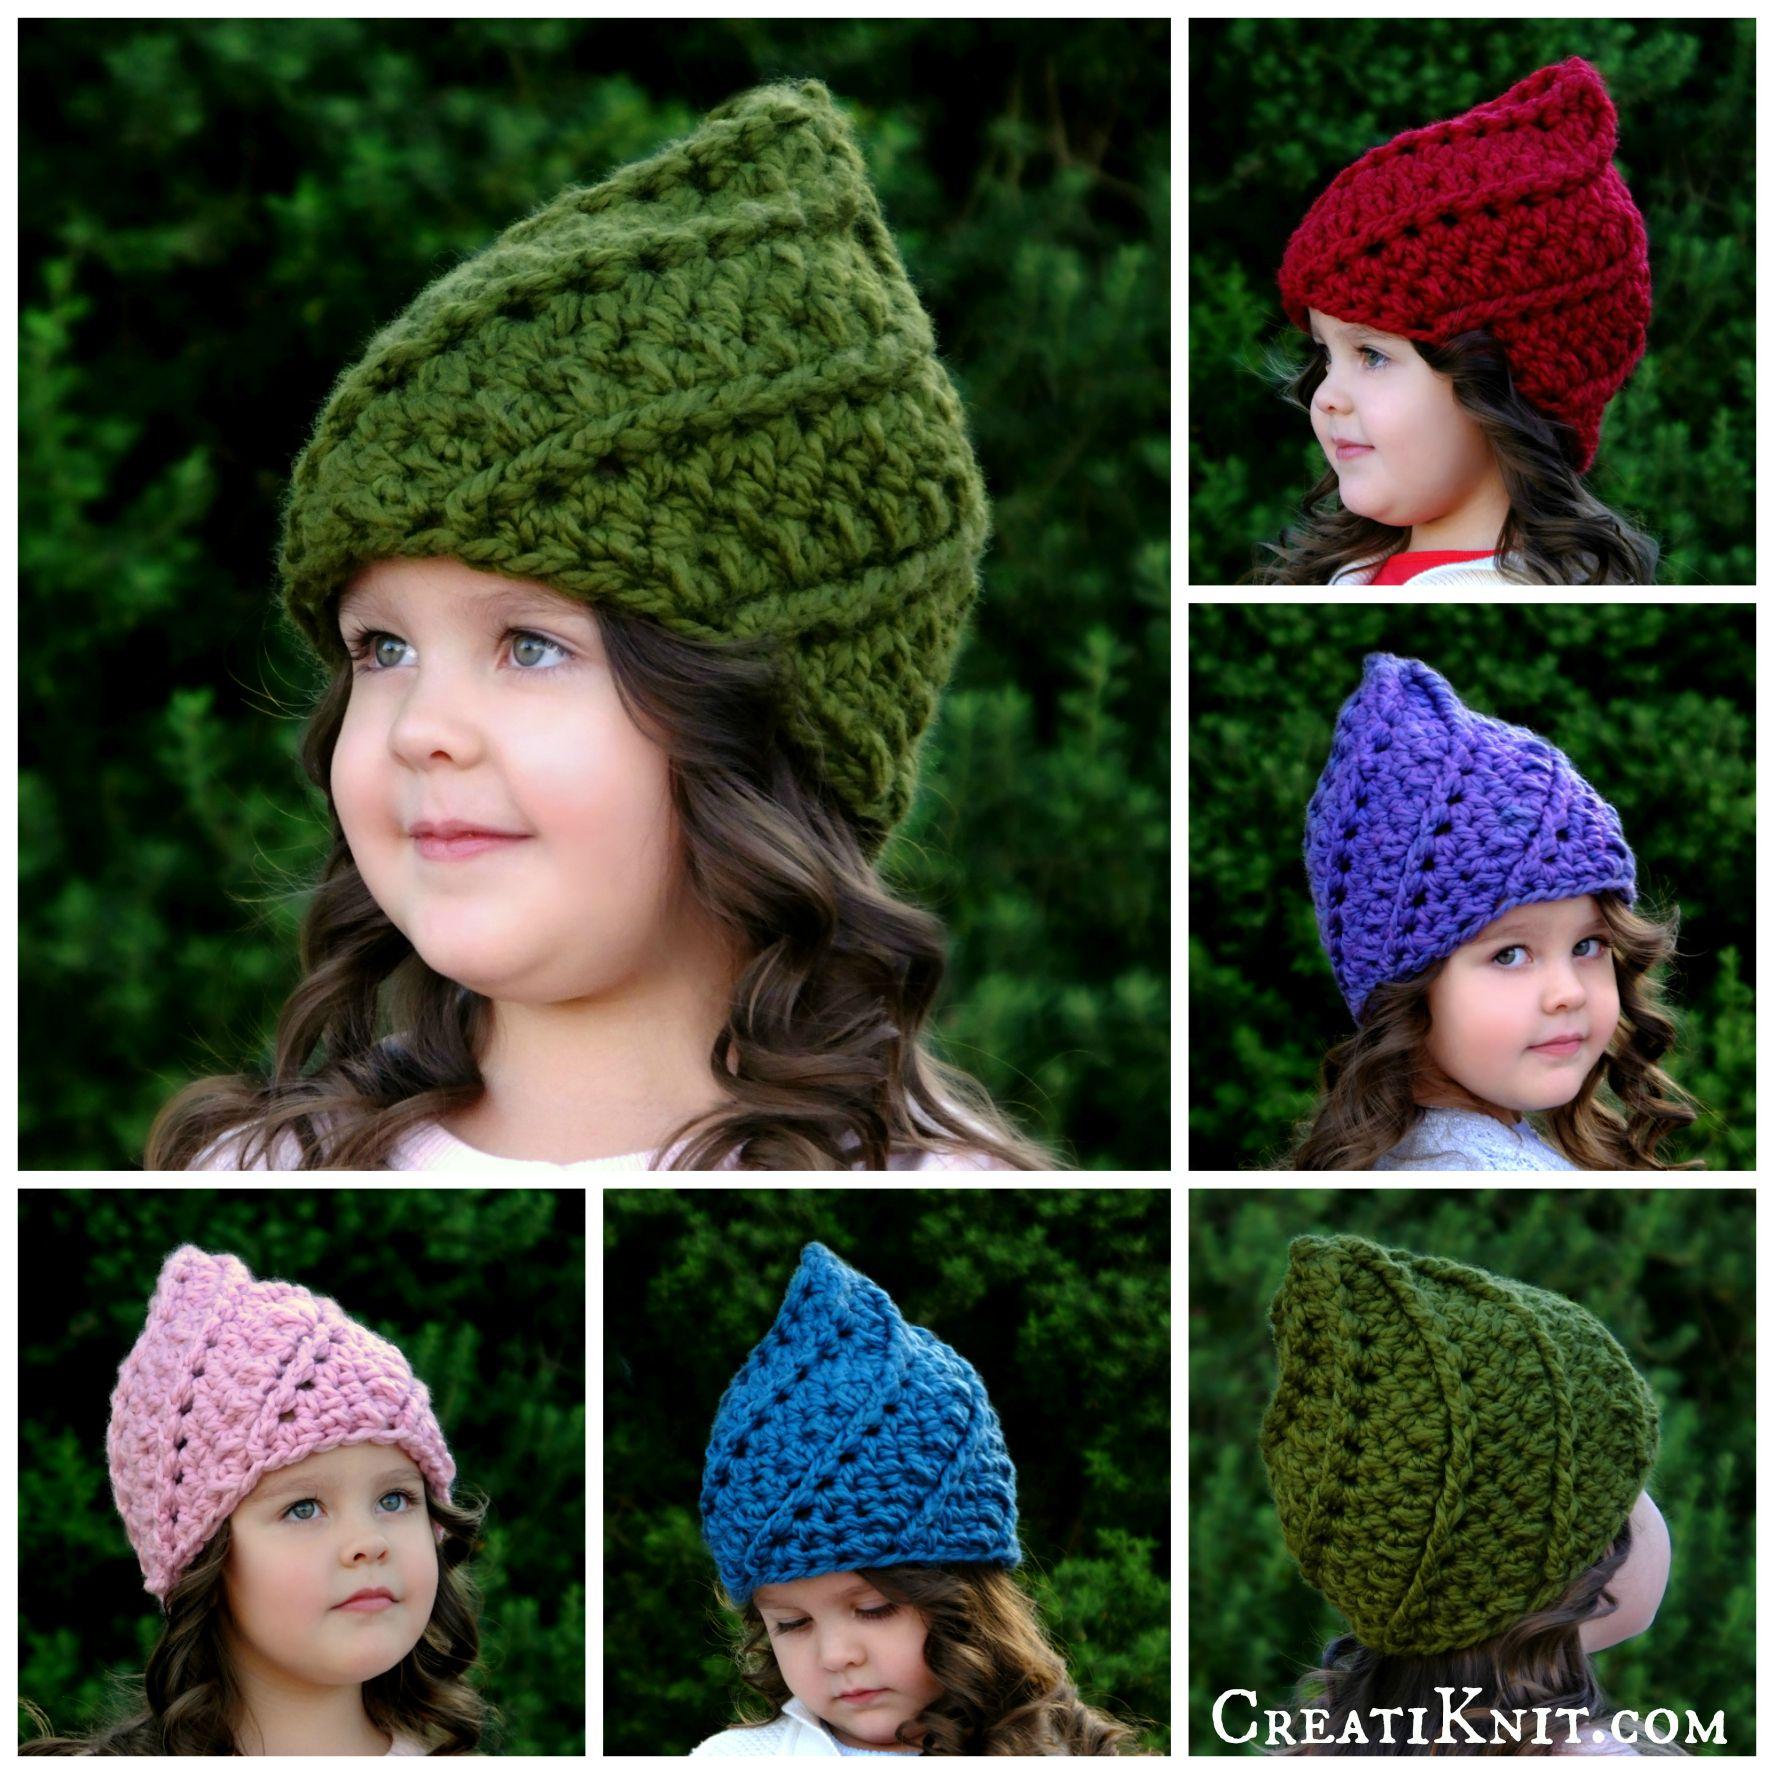 b44bf9eeea8  lt 3 The Glenn Gnome hat crochet pattern  lt 3 http